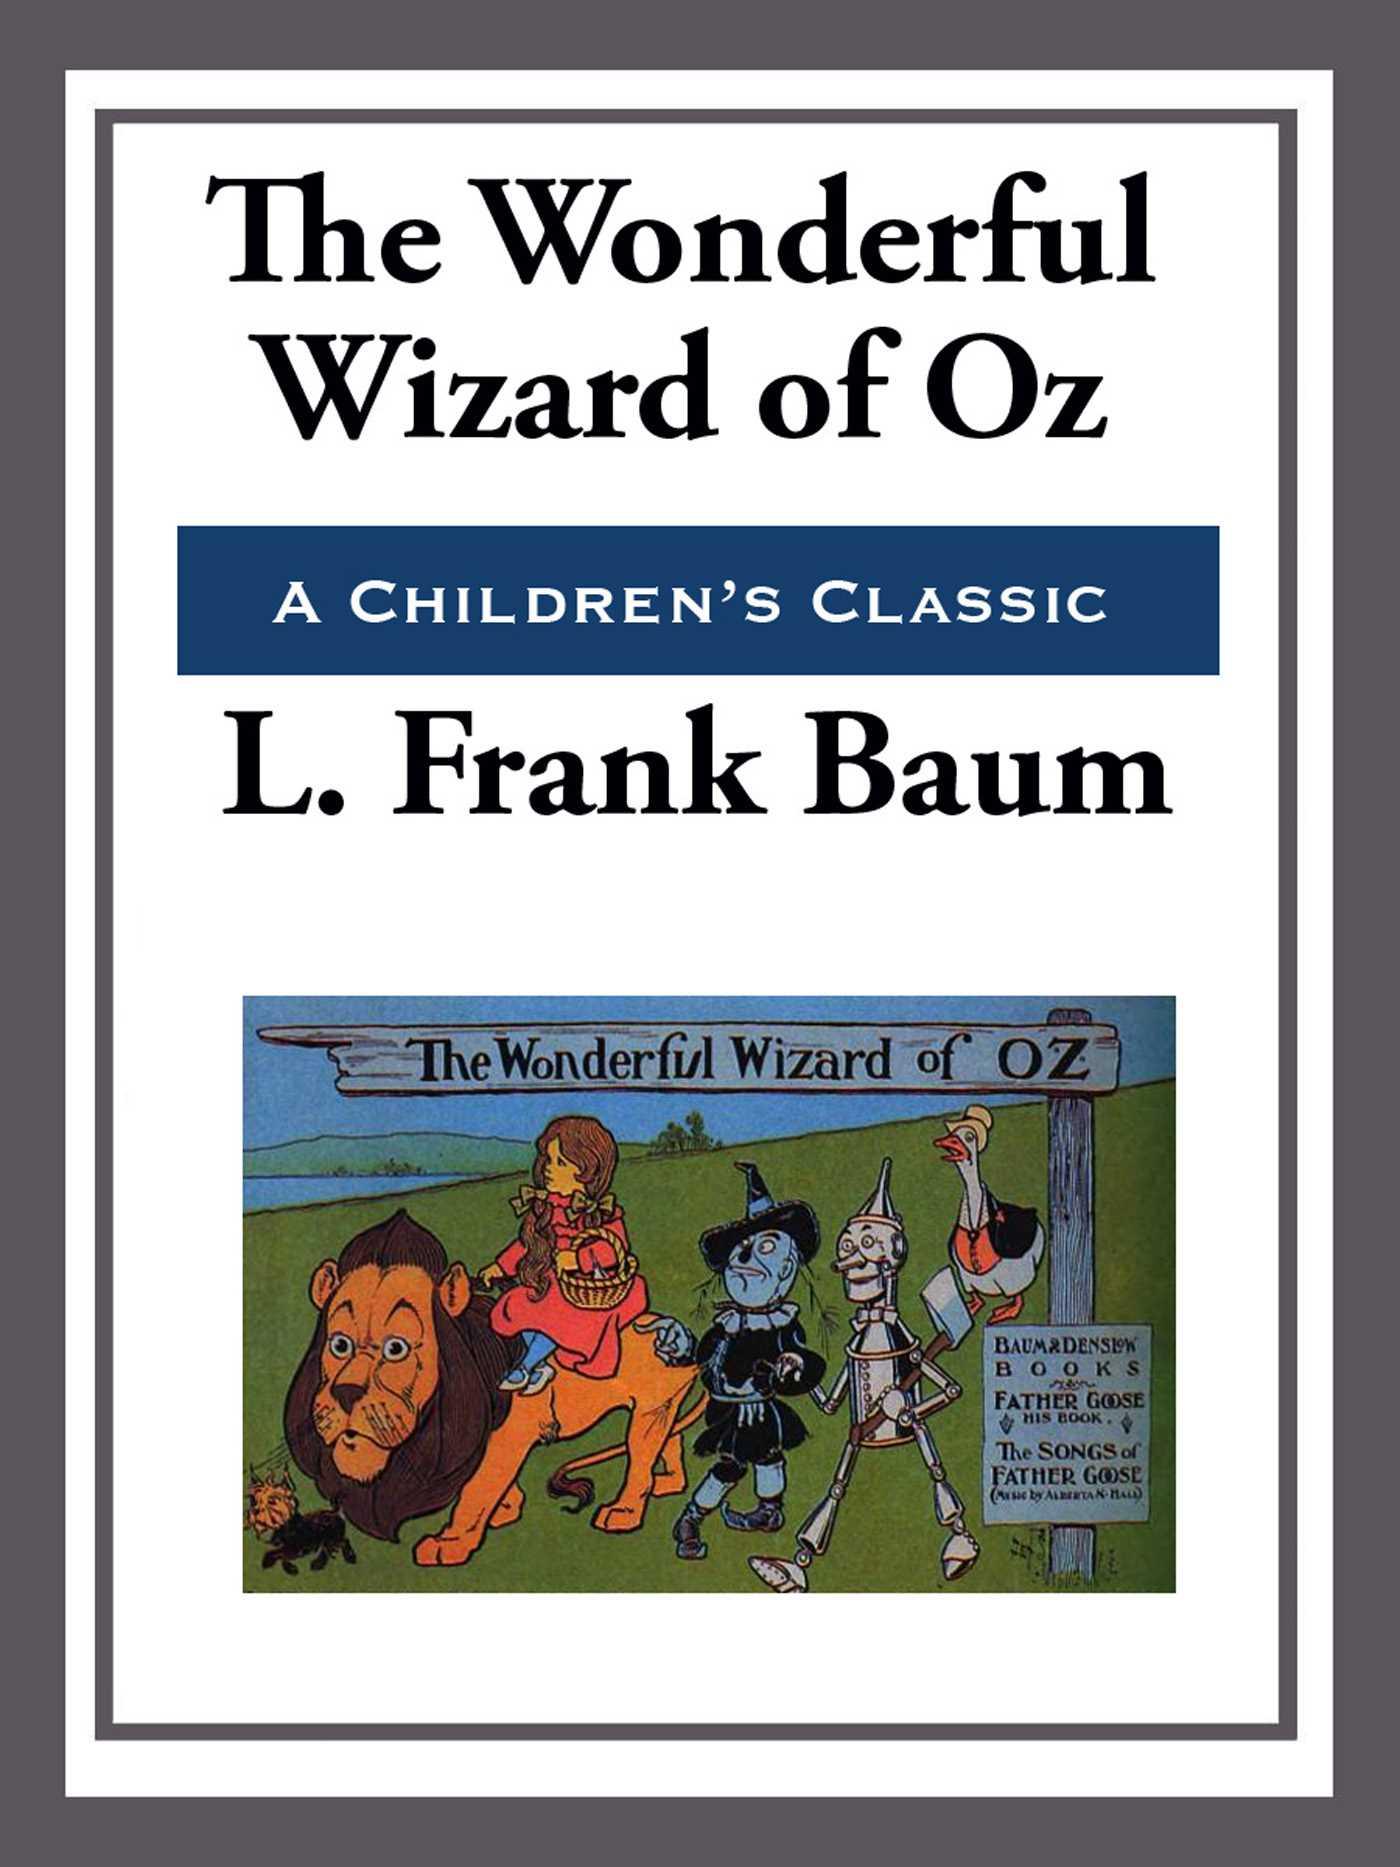 The wonderful wizard of oz 9781625588180 hr